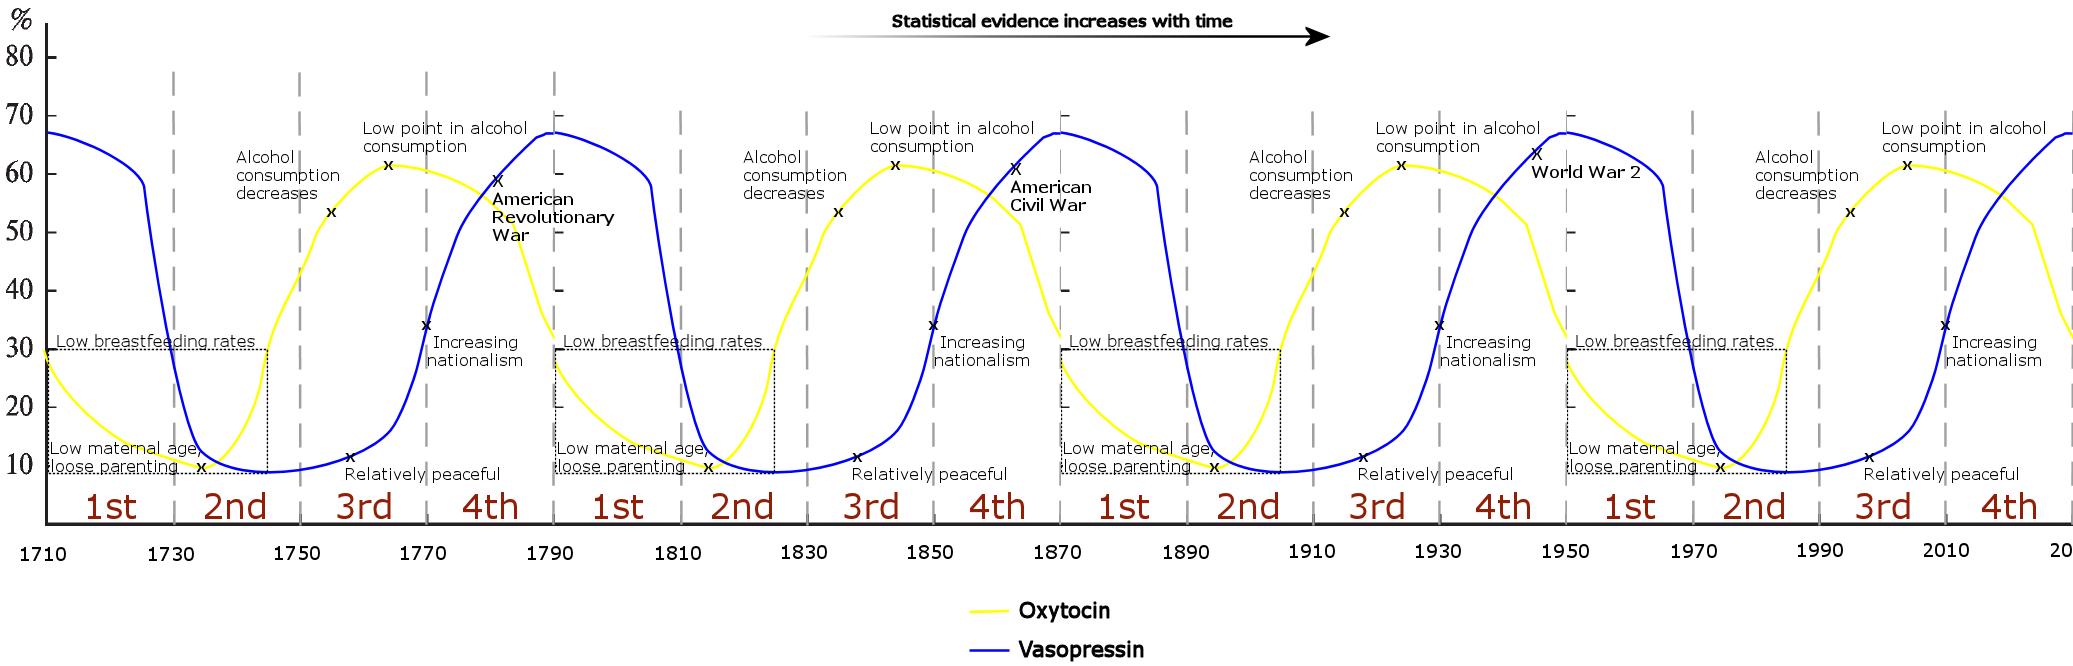 [Image: oxytocin-vasopressin-generational-levels-2-long.png]